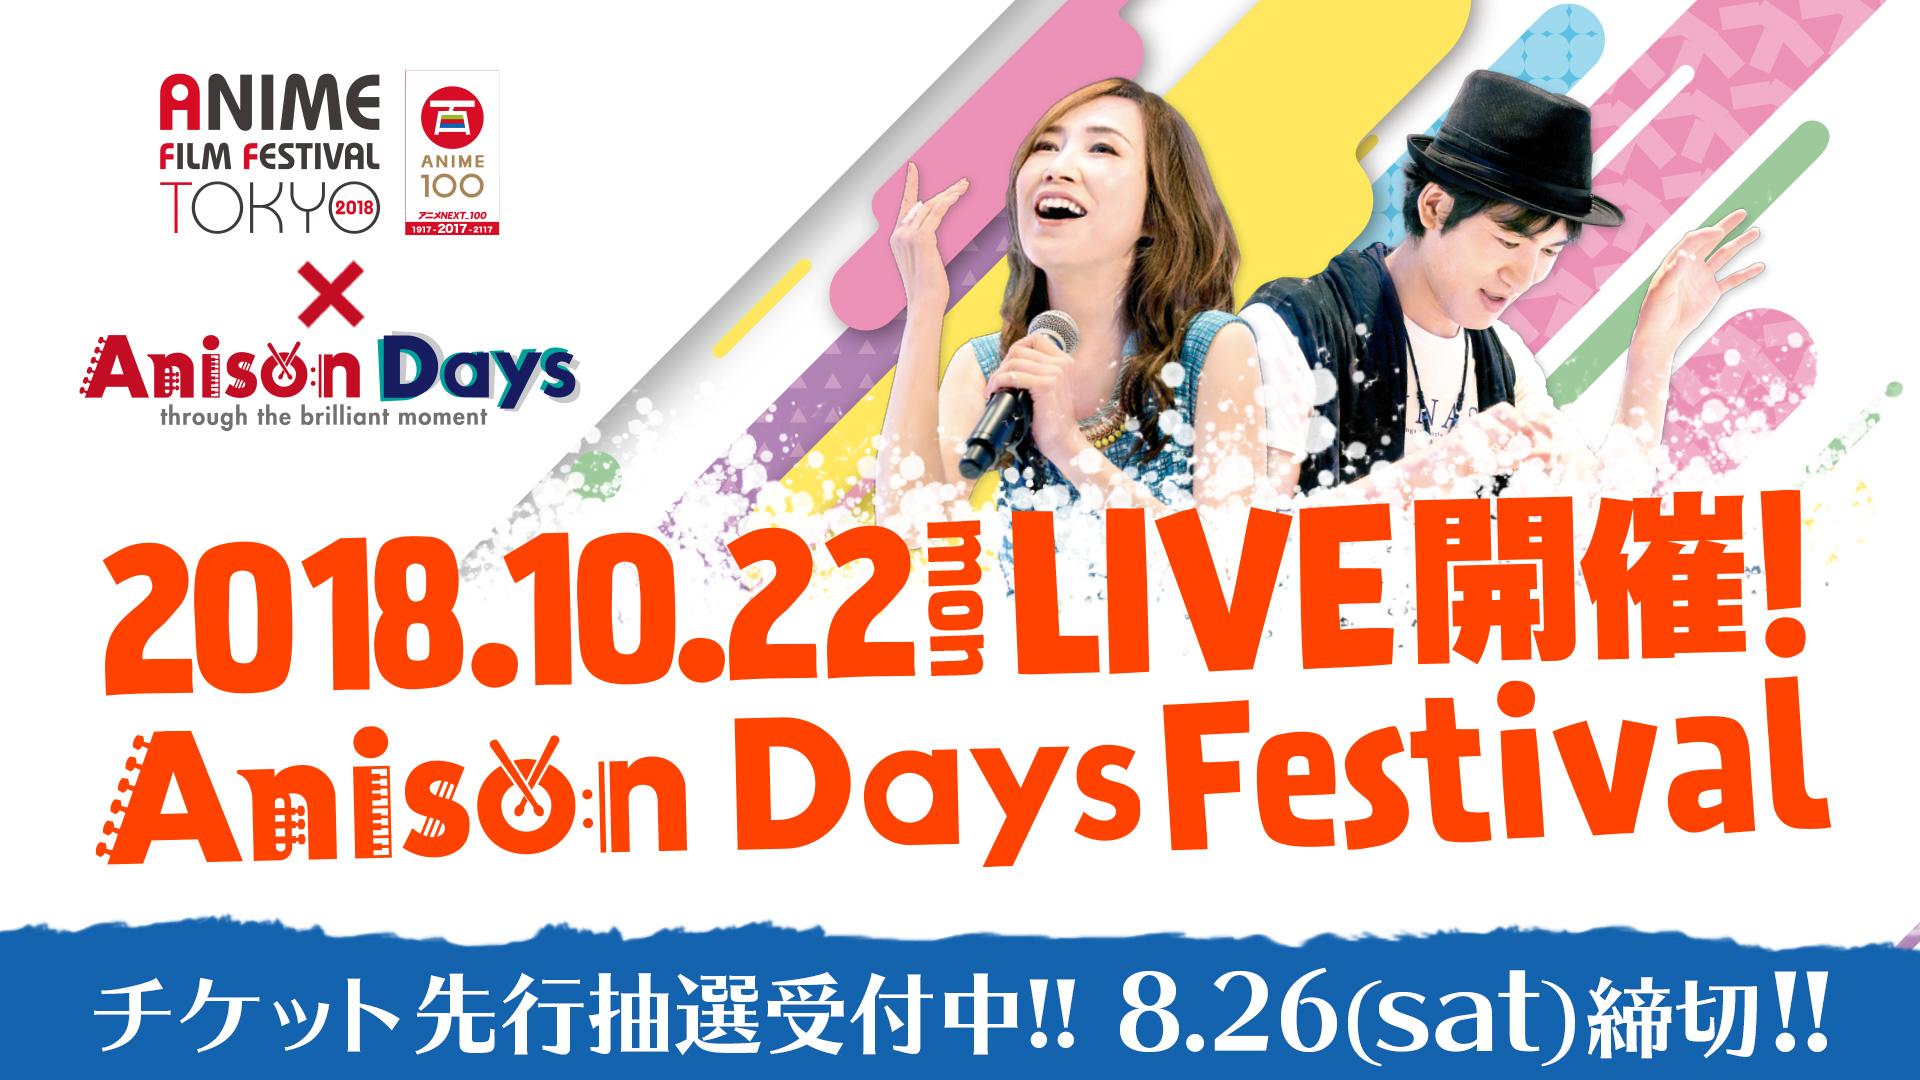 Anison Days Festival ~アニメフィルムフェスティバル東京2018×Anison Days~